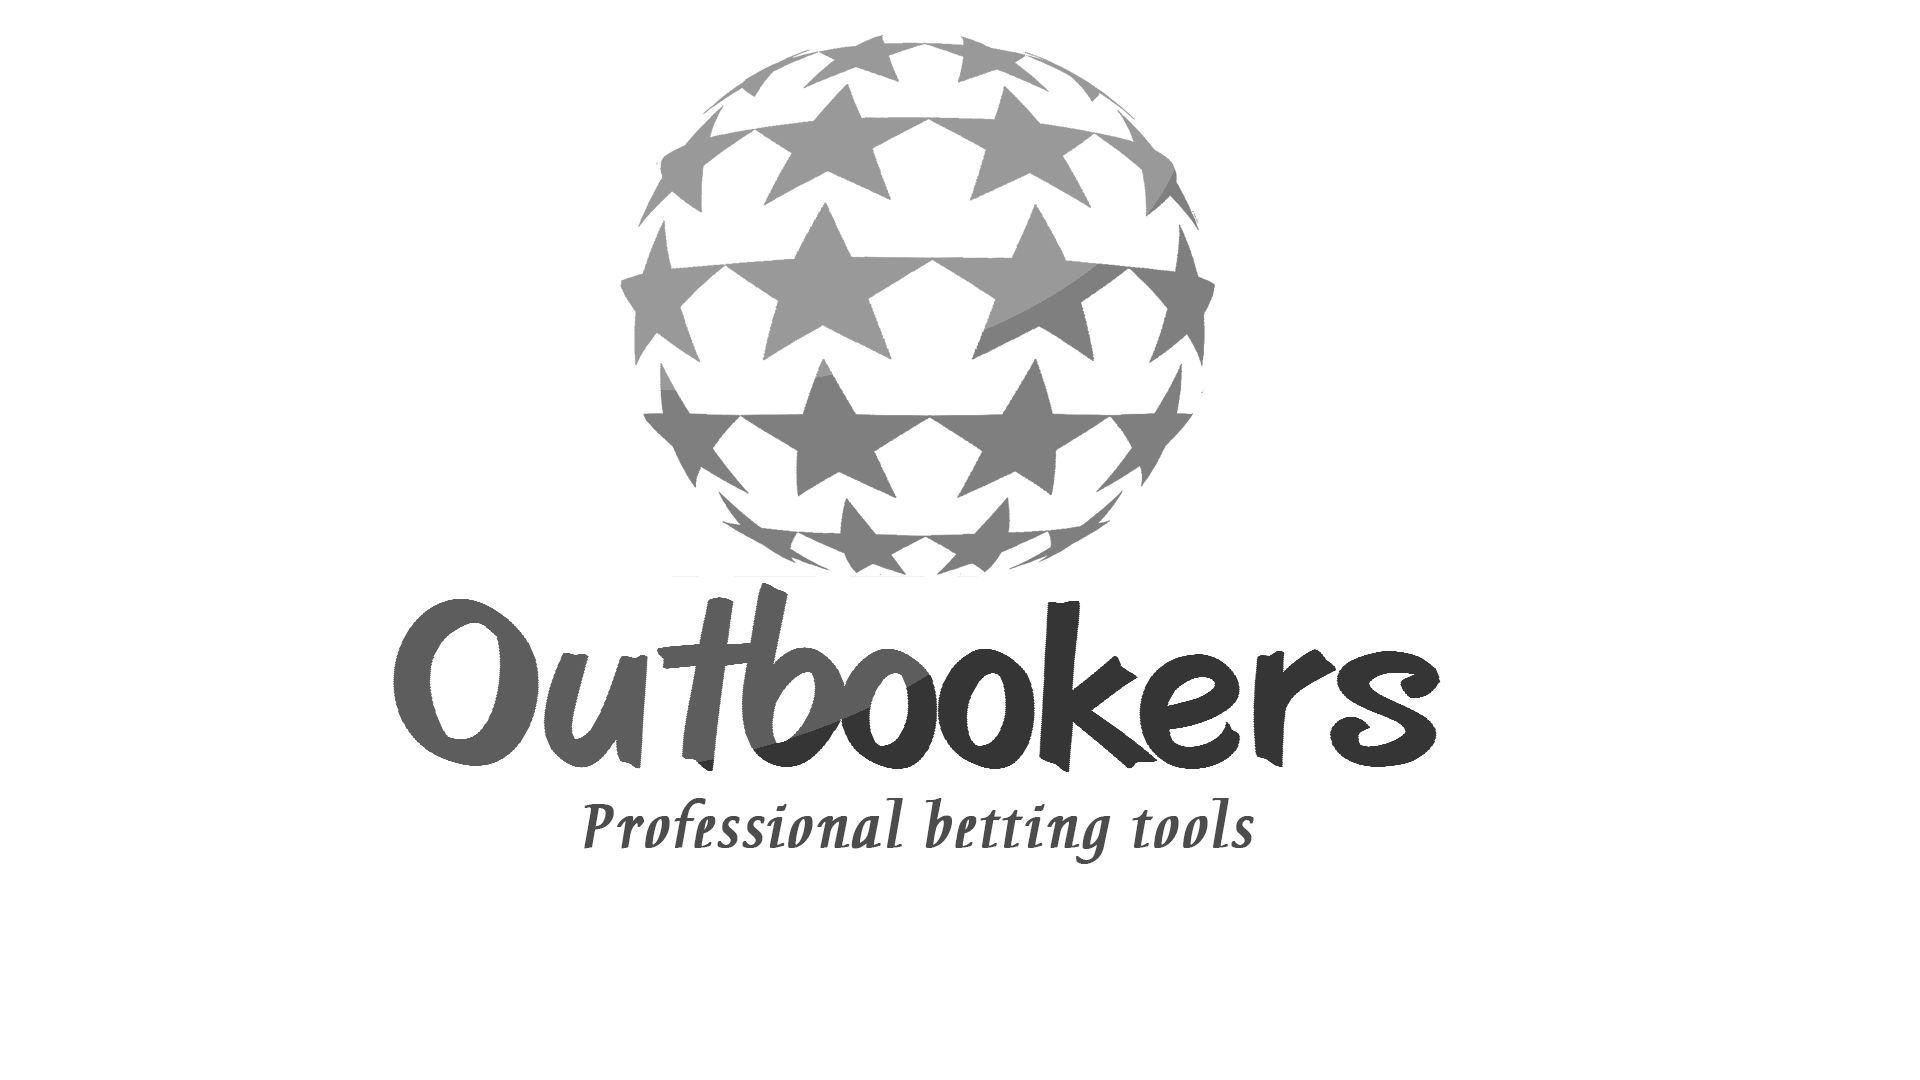 Логотип для компании (спортивная аналитика) - дизайнер RayGamesThe